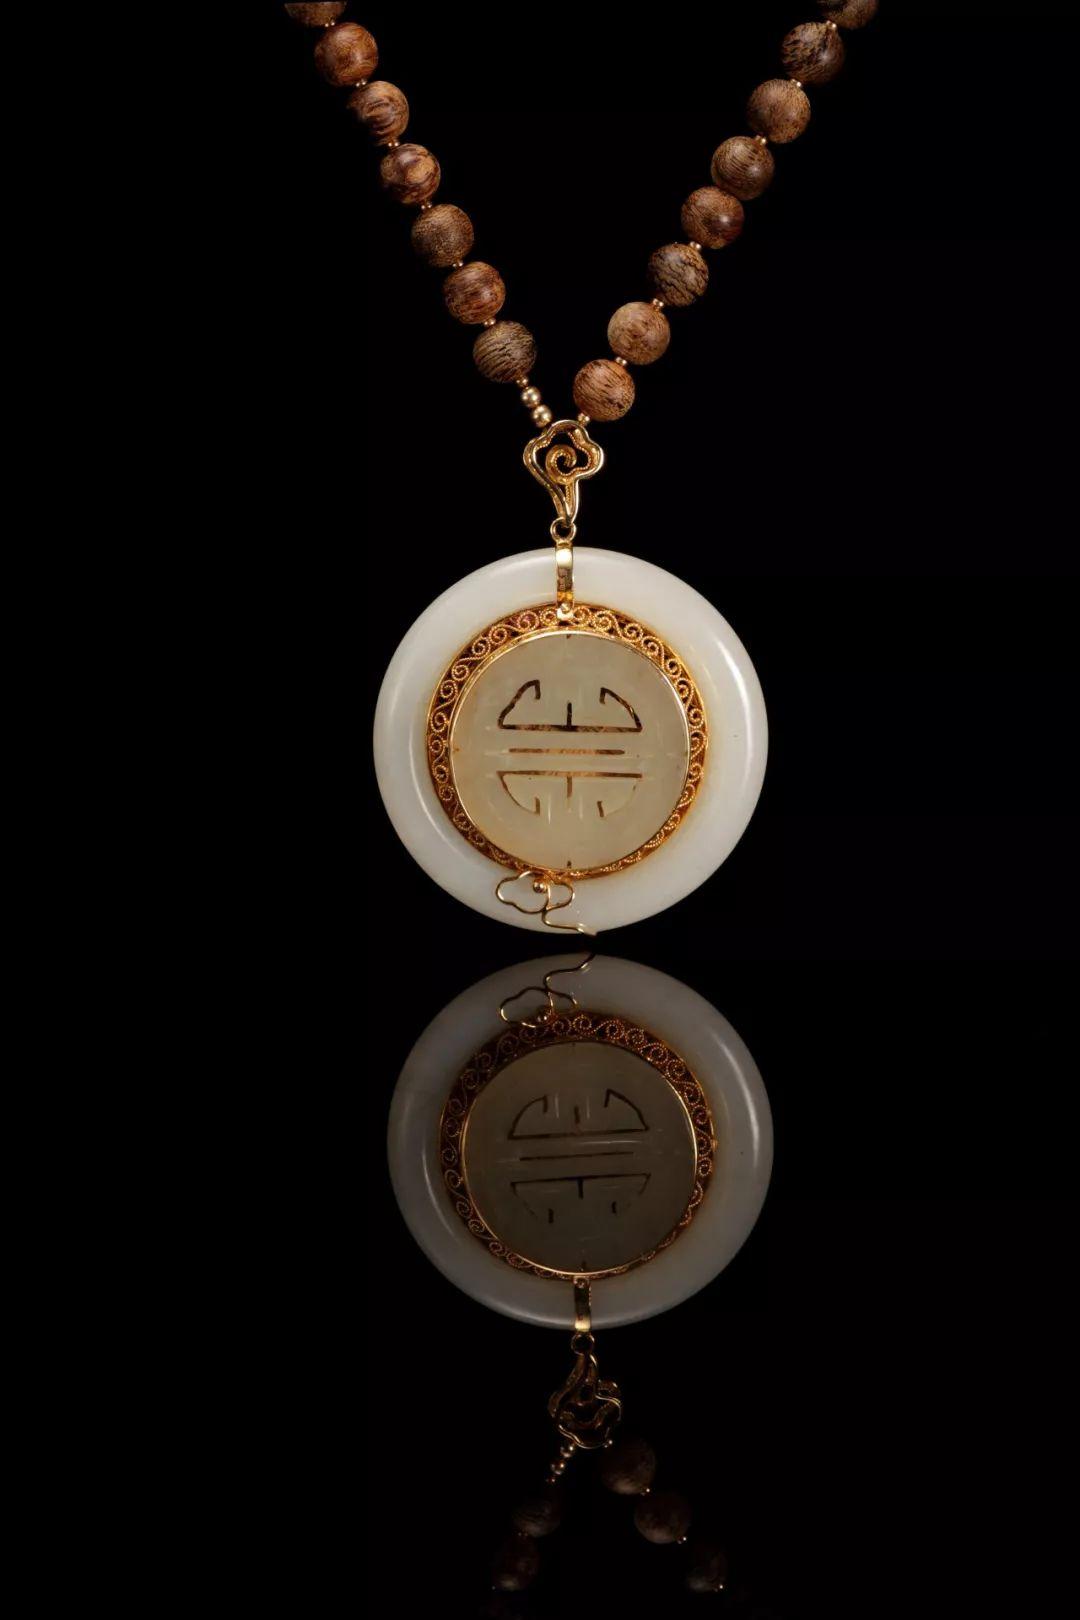 GAC独立首饰设计师联展 珠宝制作工艺